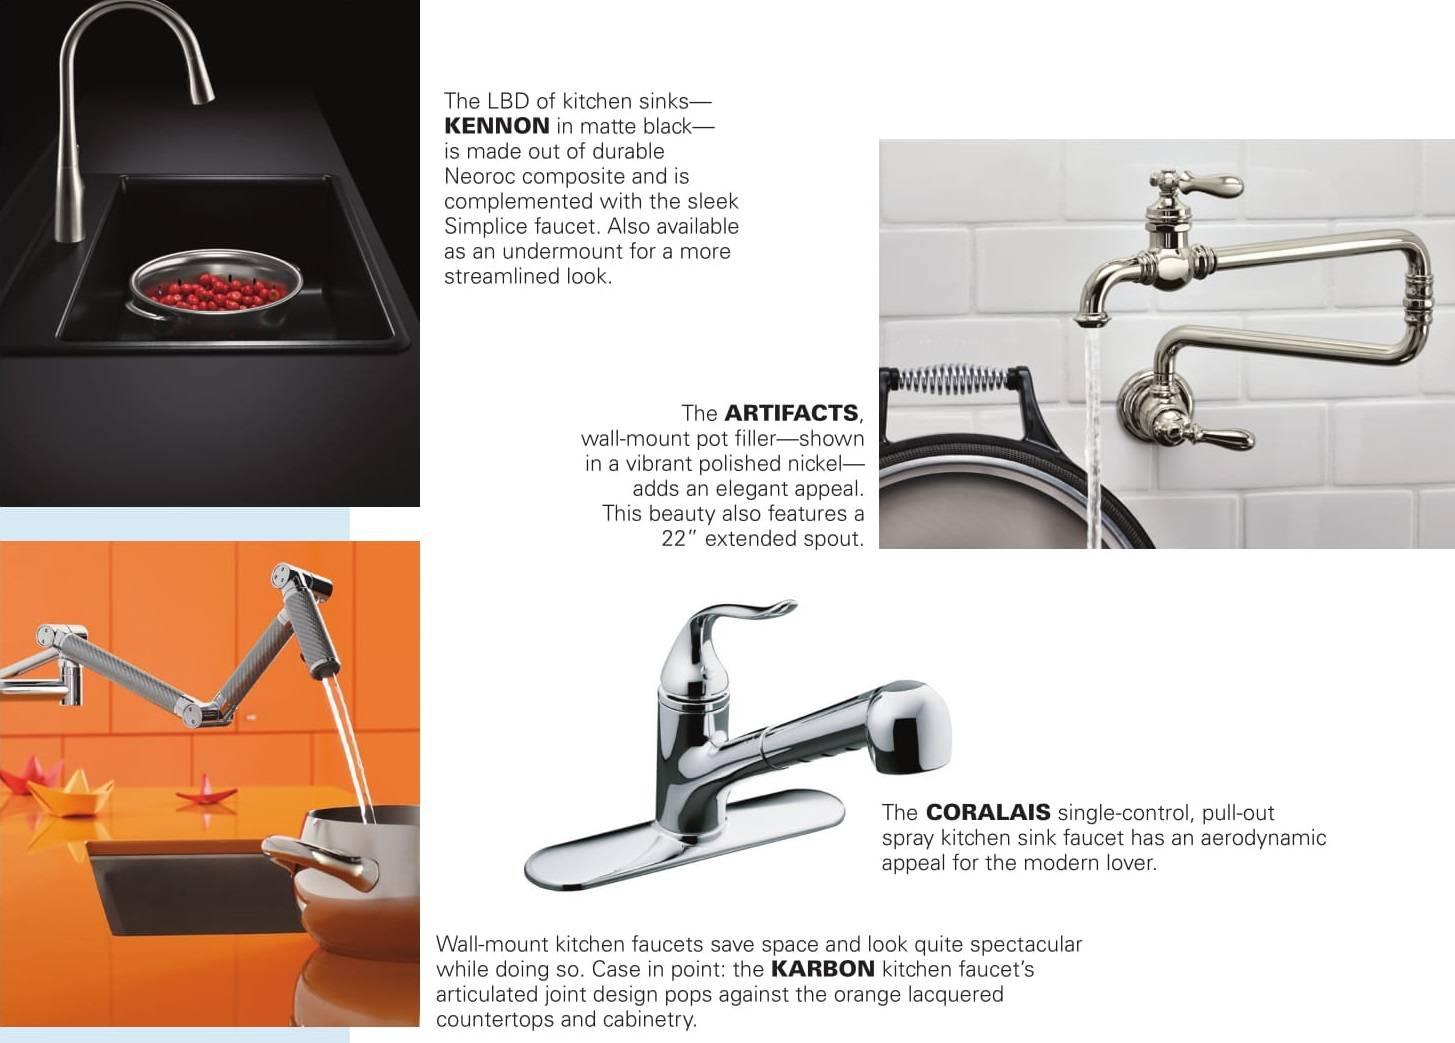 general plumbing supply kitchen faucet